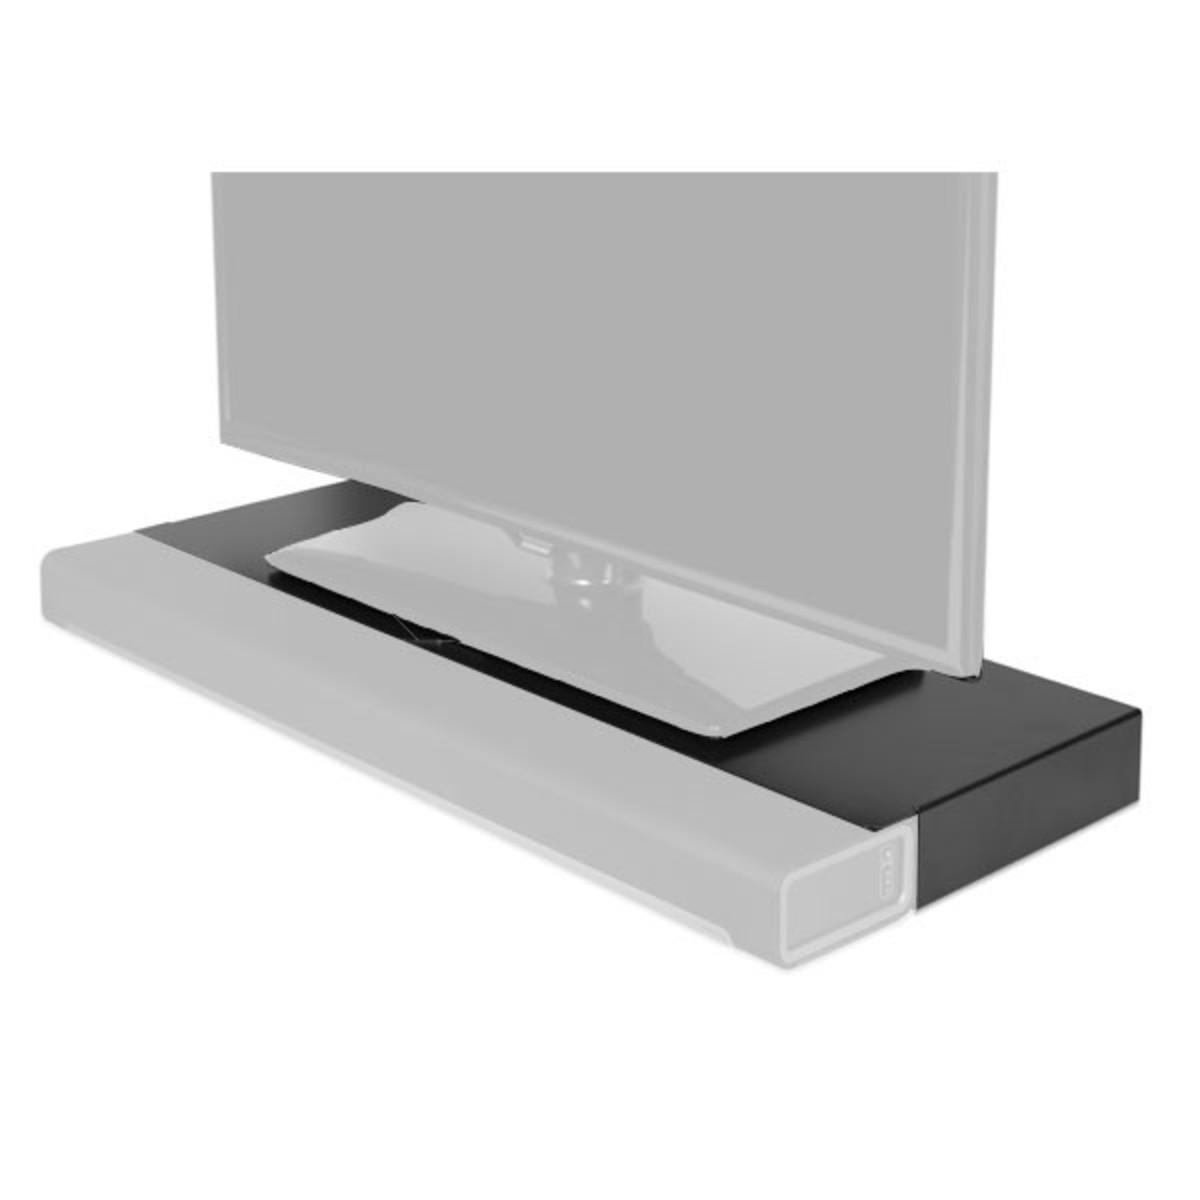 Meuble Tv Flexson Pour Sonos Playbar Noir Gear4music Com # Meuble Tv En Noir